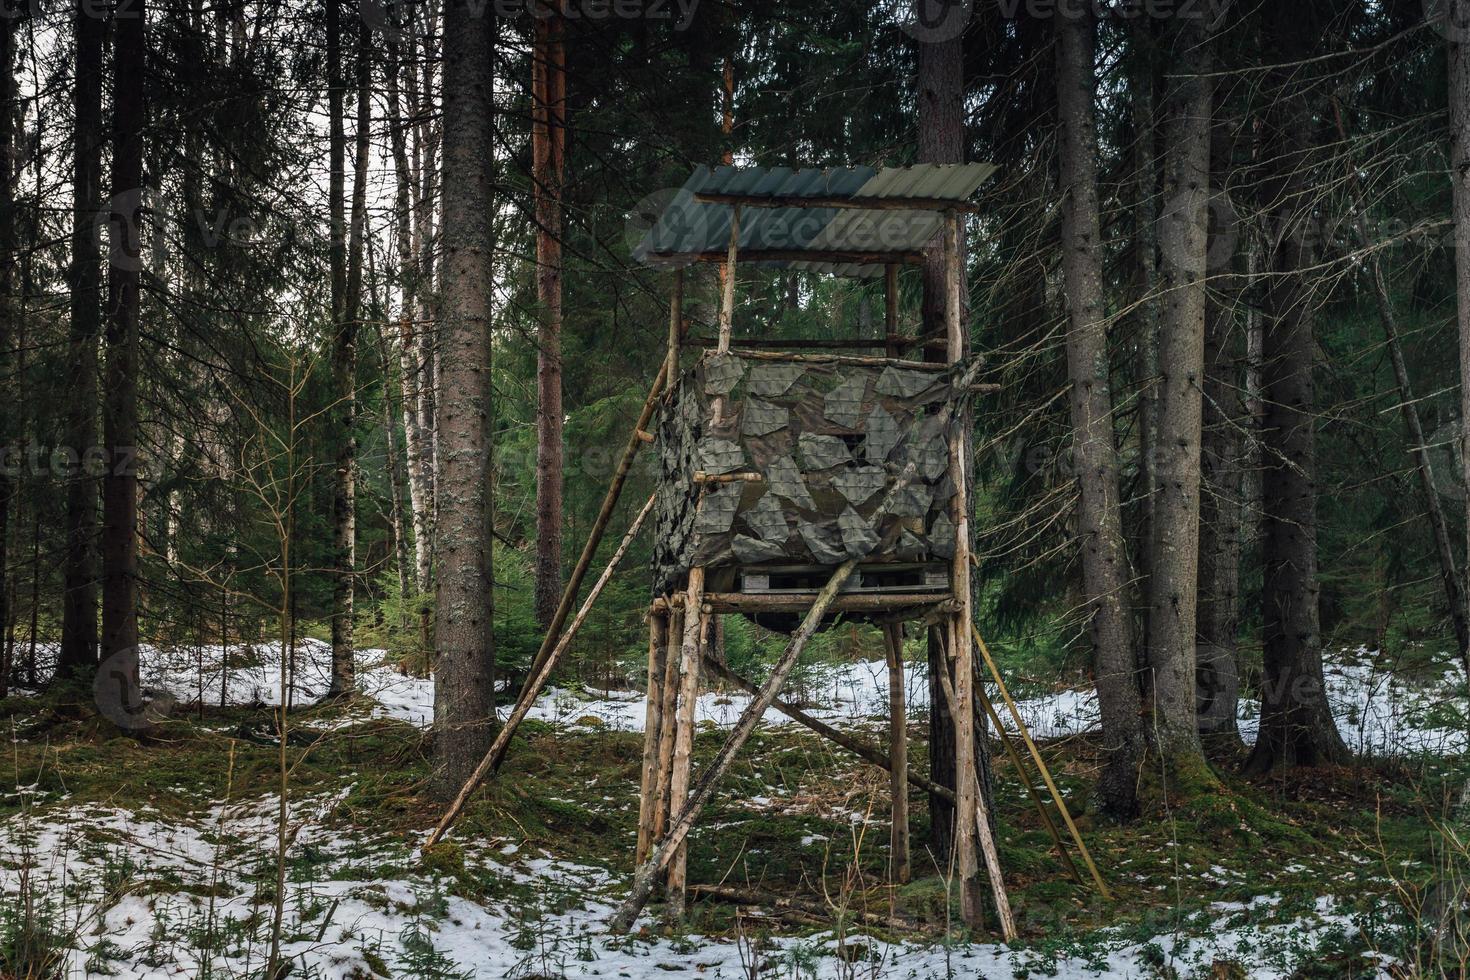 Jagdturm stehend in einem Wald foto